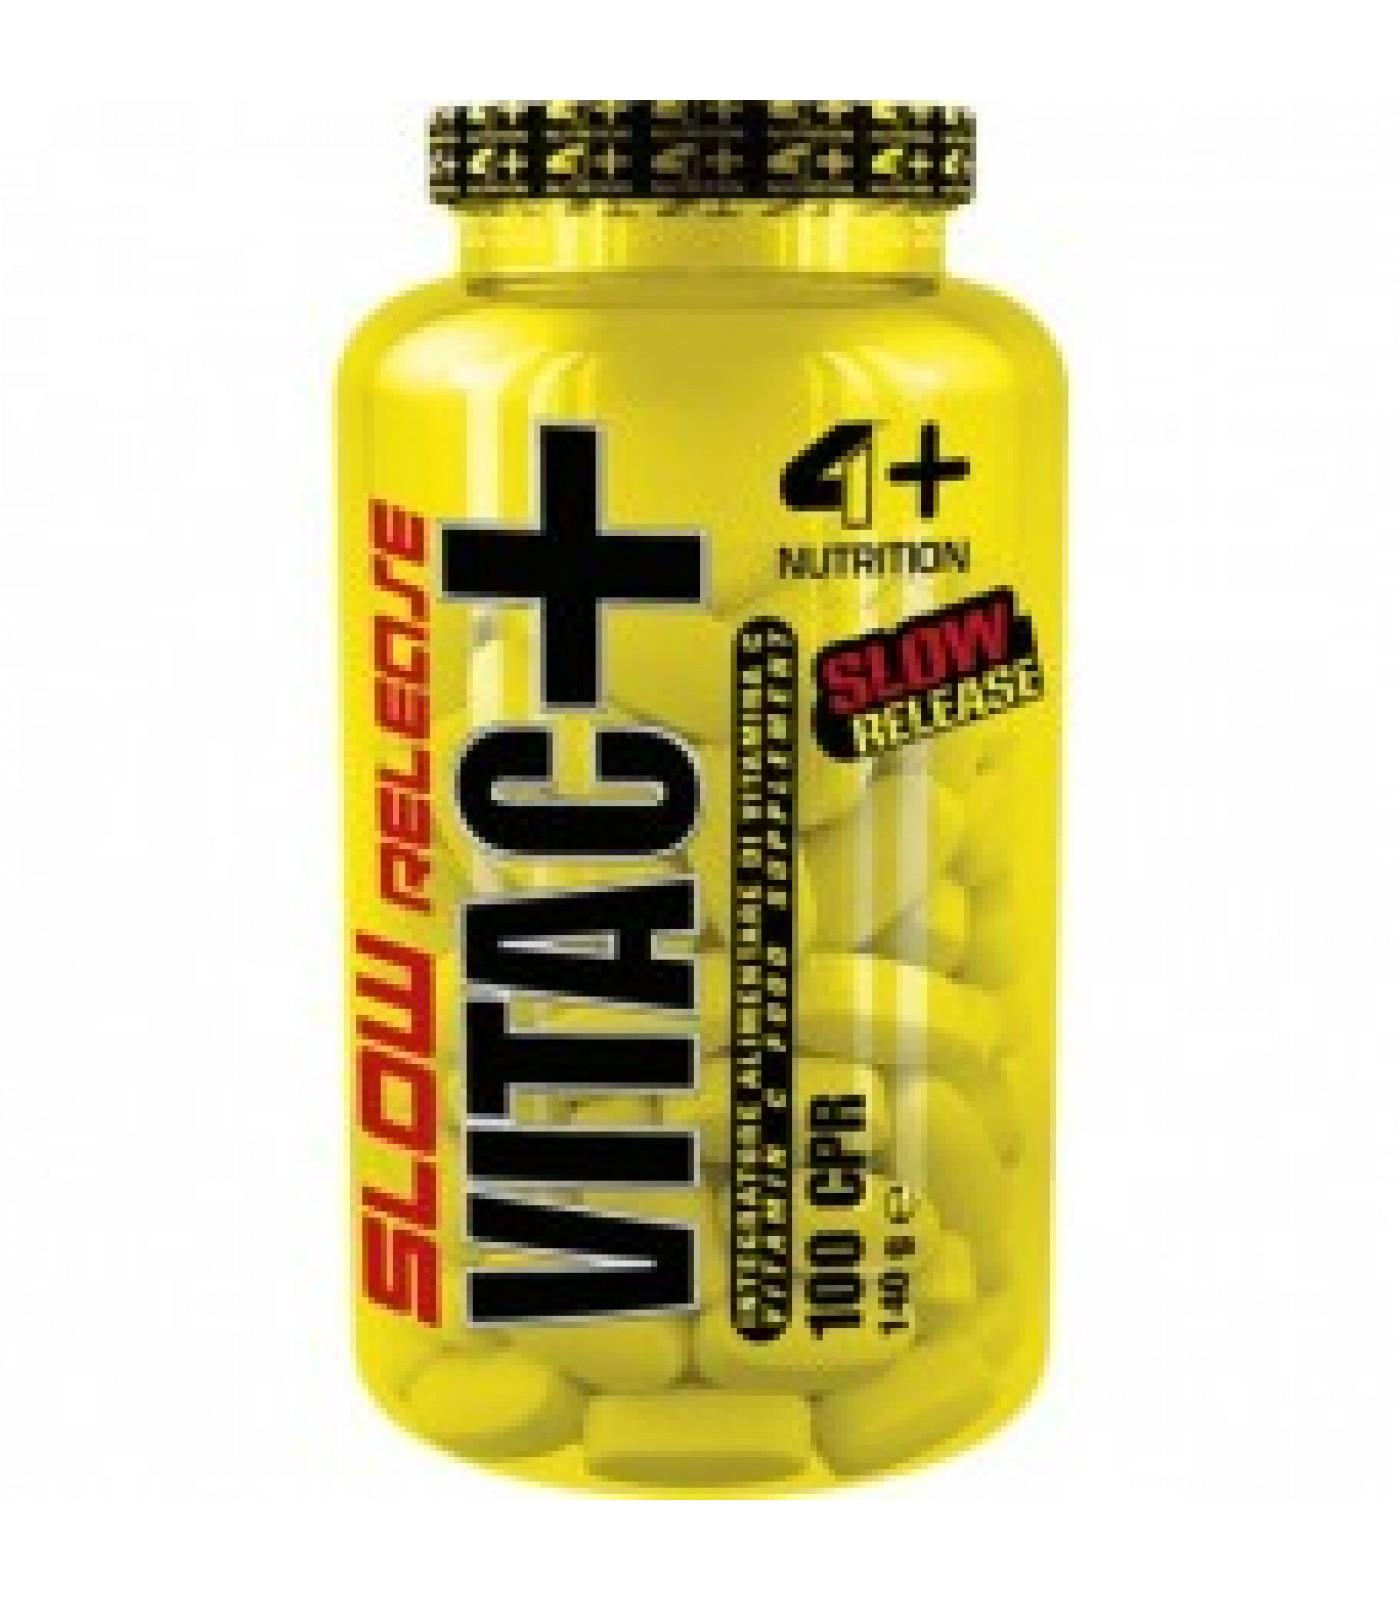 4+ Nutrition VITA C+ Slow Release / 100 таблетки